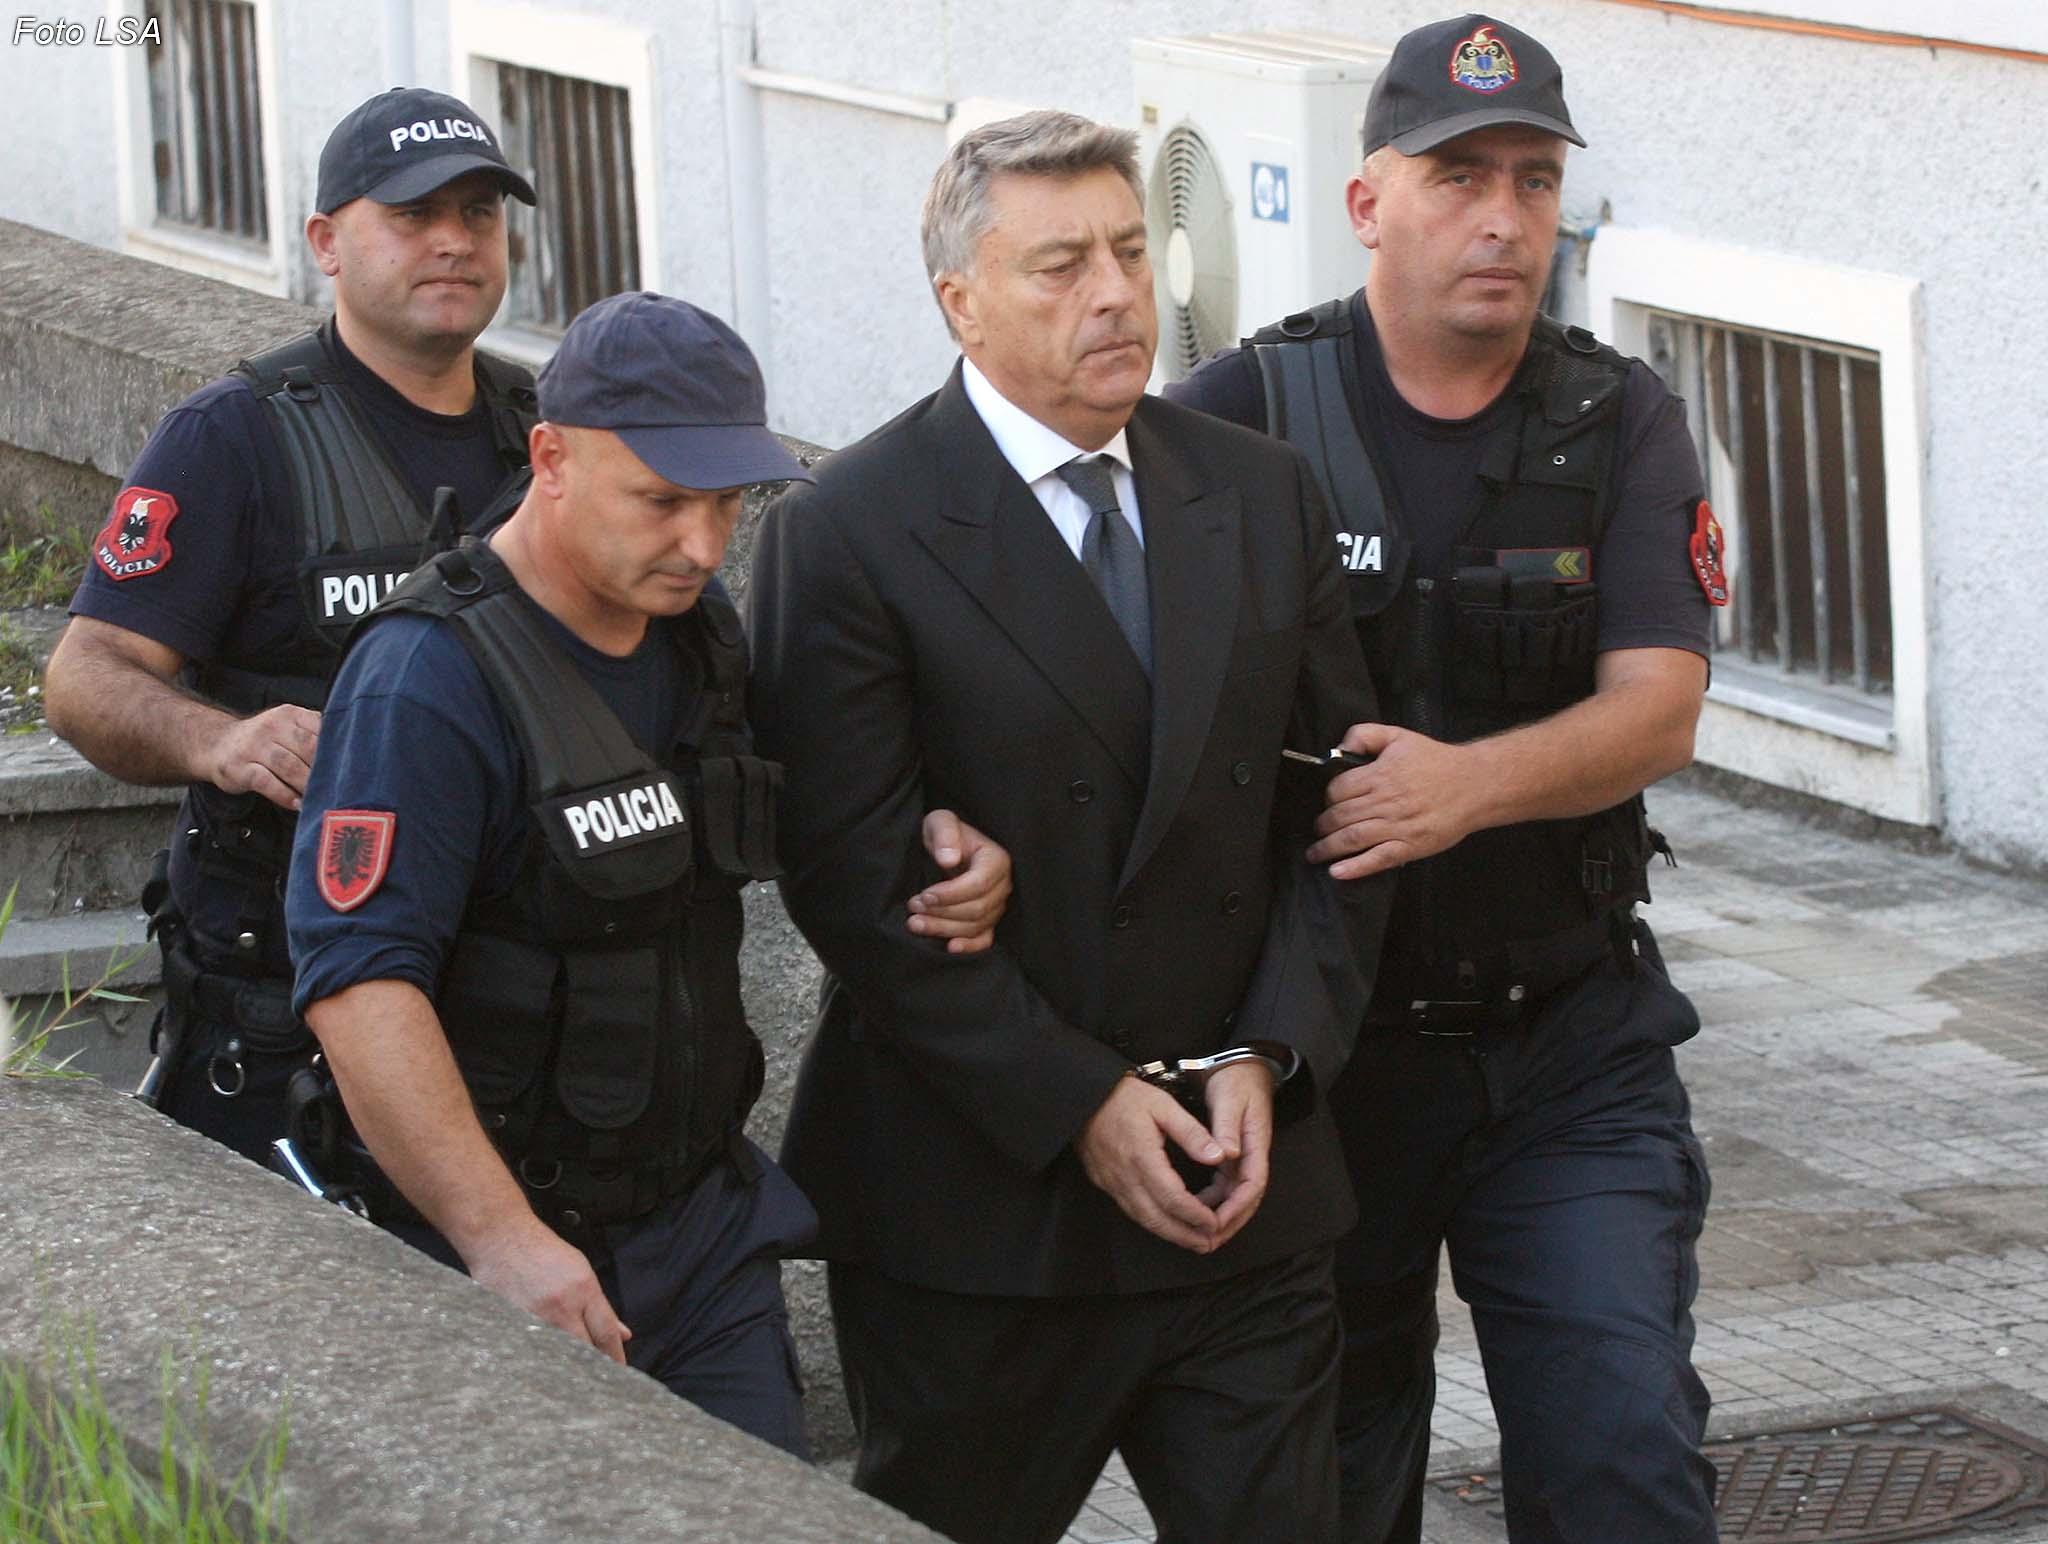 "LIROHET ARDIAN FULLANI - Ish guvernatori i Bankes se Shqiperise, Ardian Fullani, duke hyre ne nje seance ne gjykaten e Apelit, e cila ne perfundim ka vendosur masen ""arrest shtepie"" per ish guvernatorin./r/n/r/nACQUITTED ARDIAN FULLANI - Albania's central bank governor Ardian Fullani, entering a Court of Appeal hearing, which in the end decided extent ""house arrest"" for the former governor."